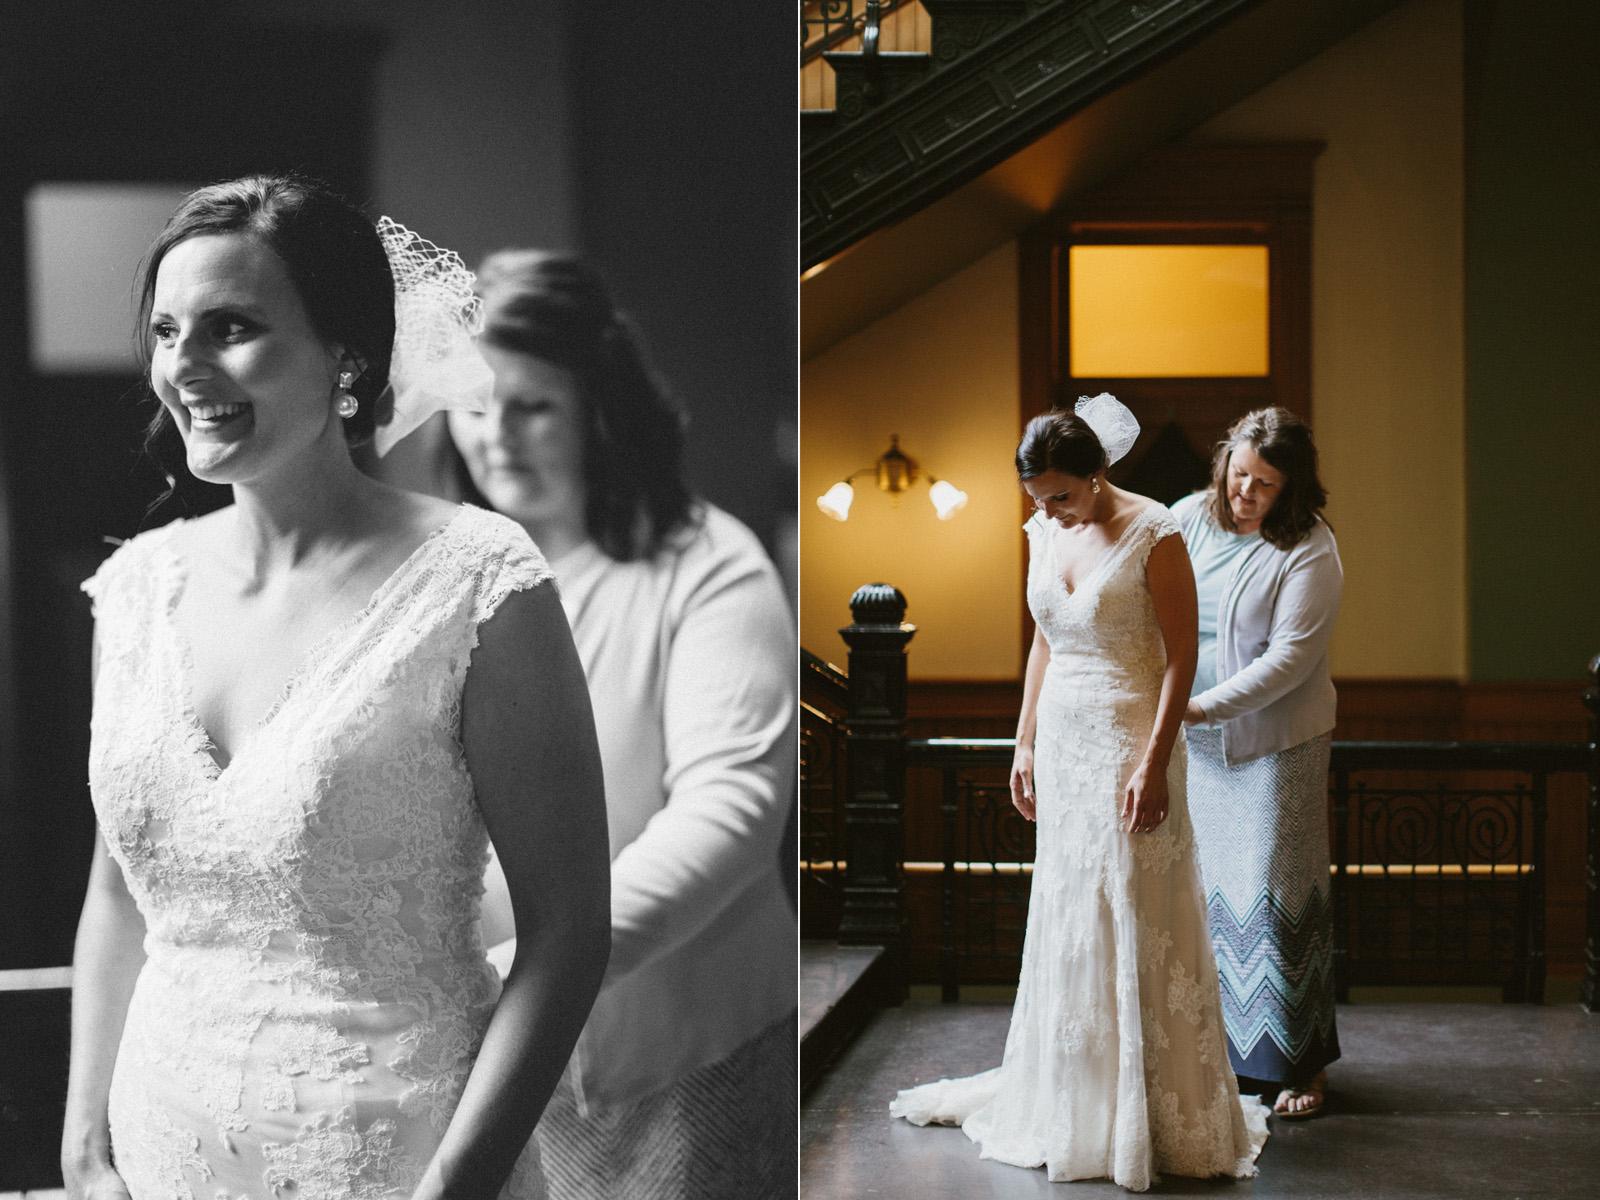 sioux_falls_desmoines_wedding_photographer_03.jpg